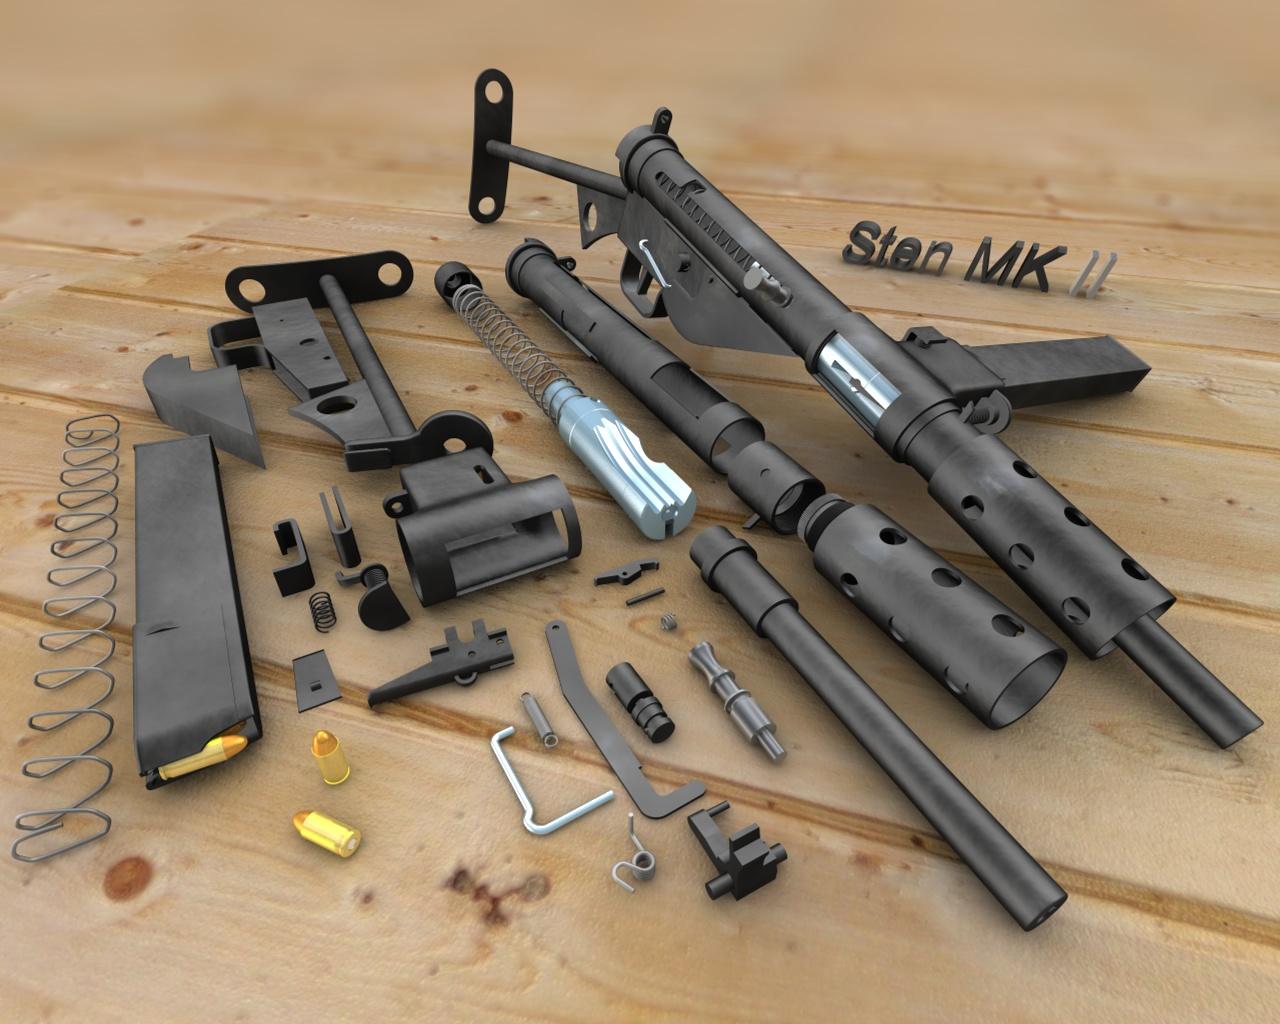 Build Laser Kit